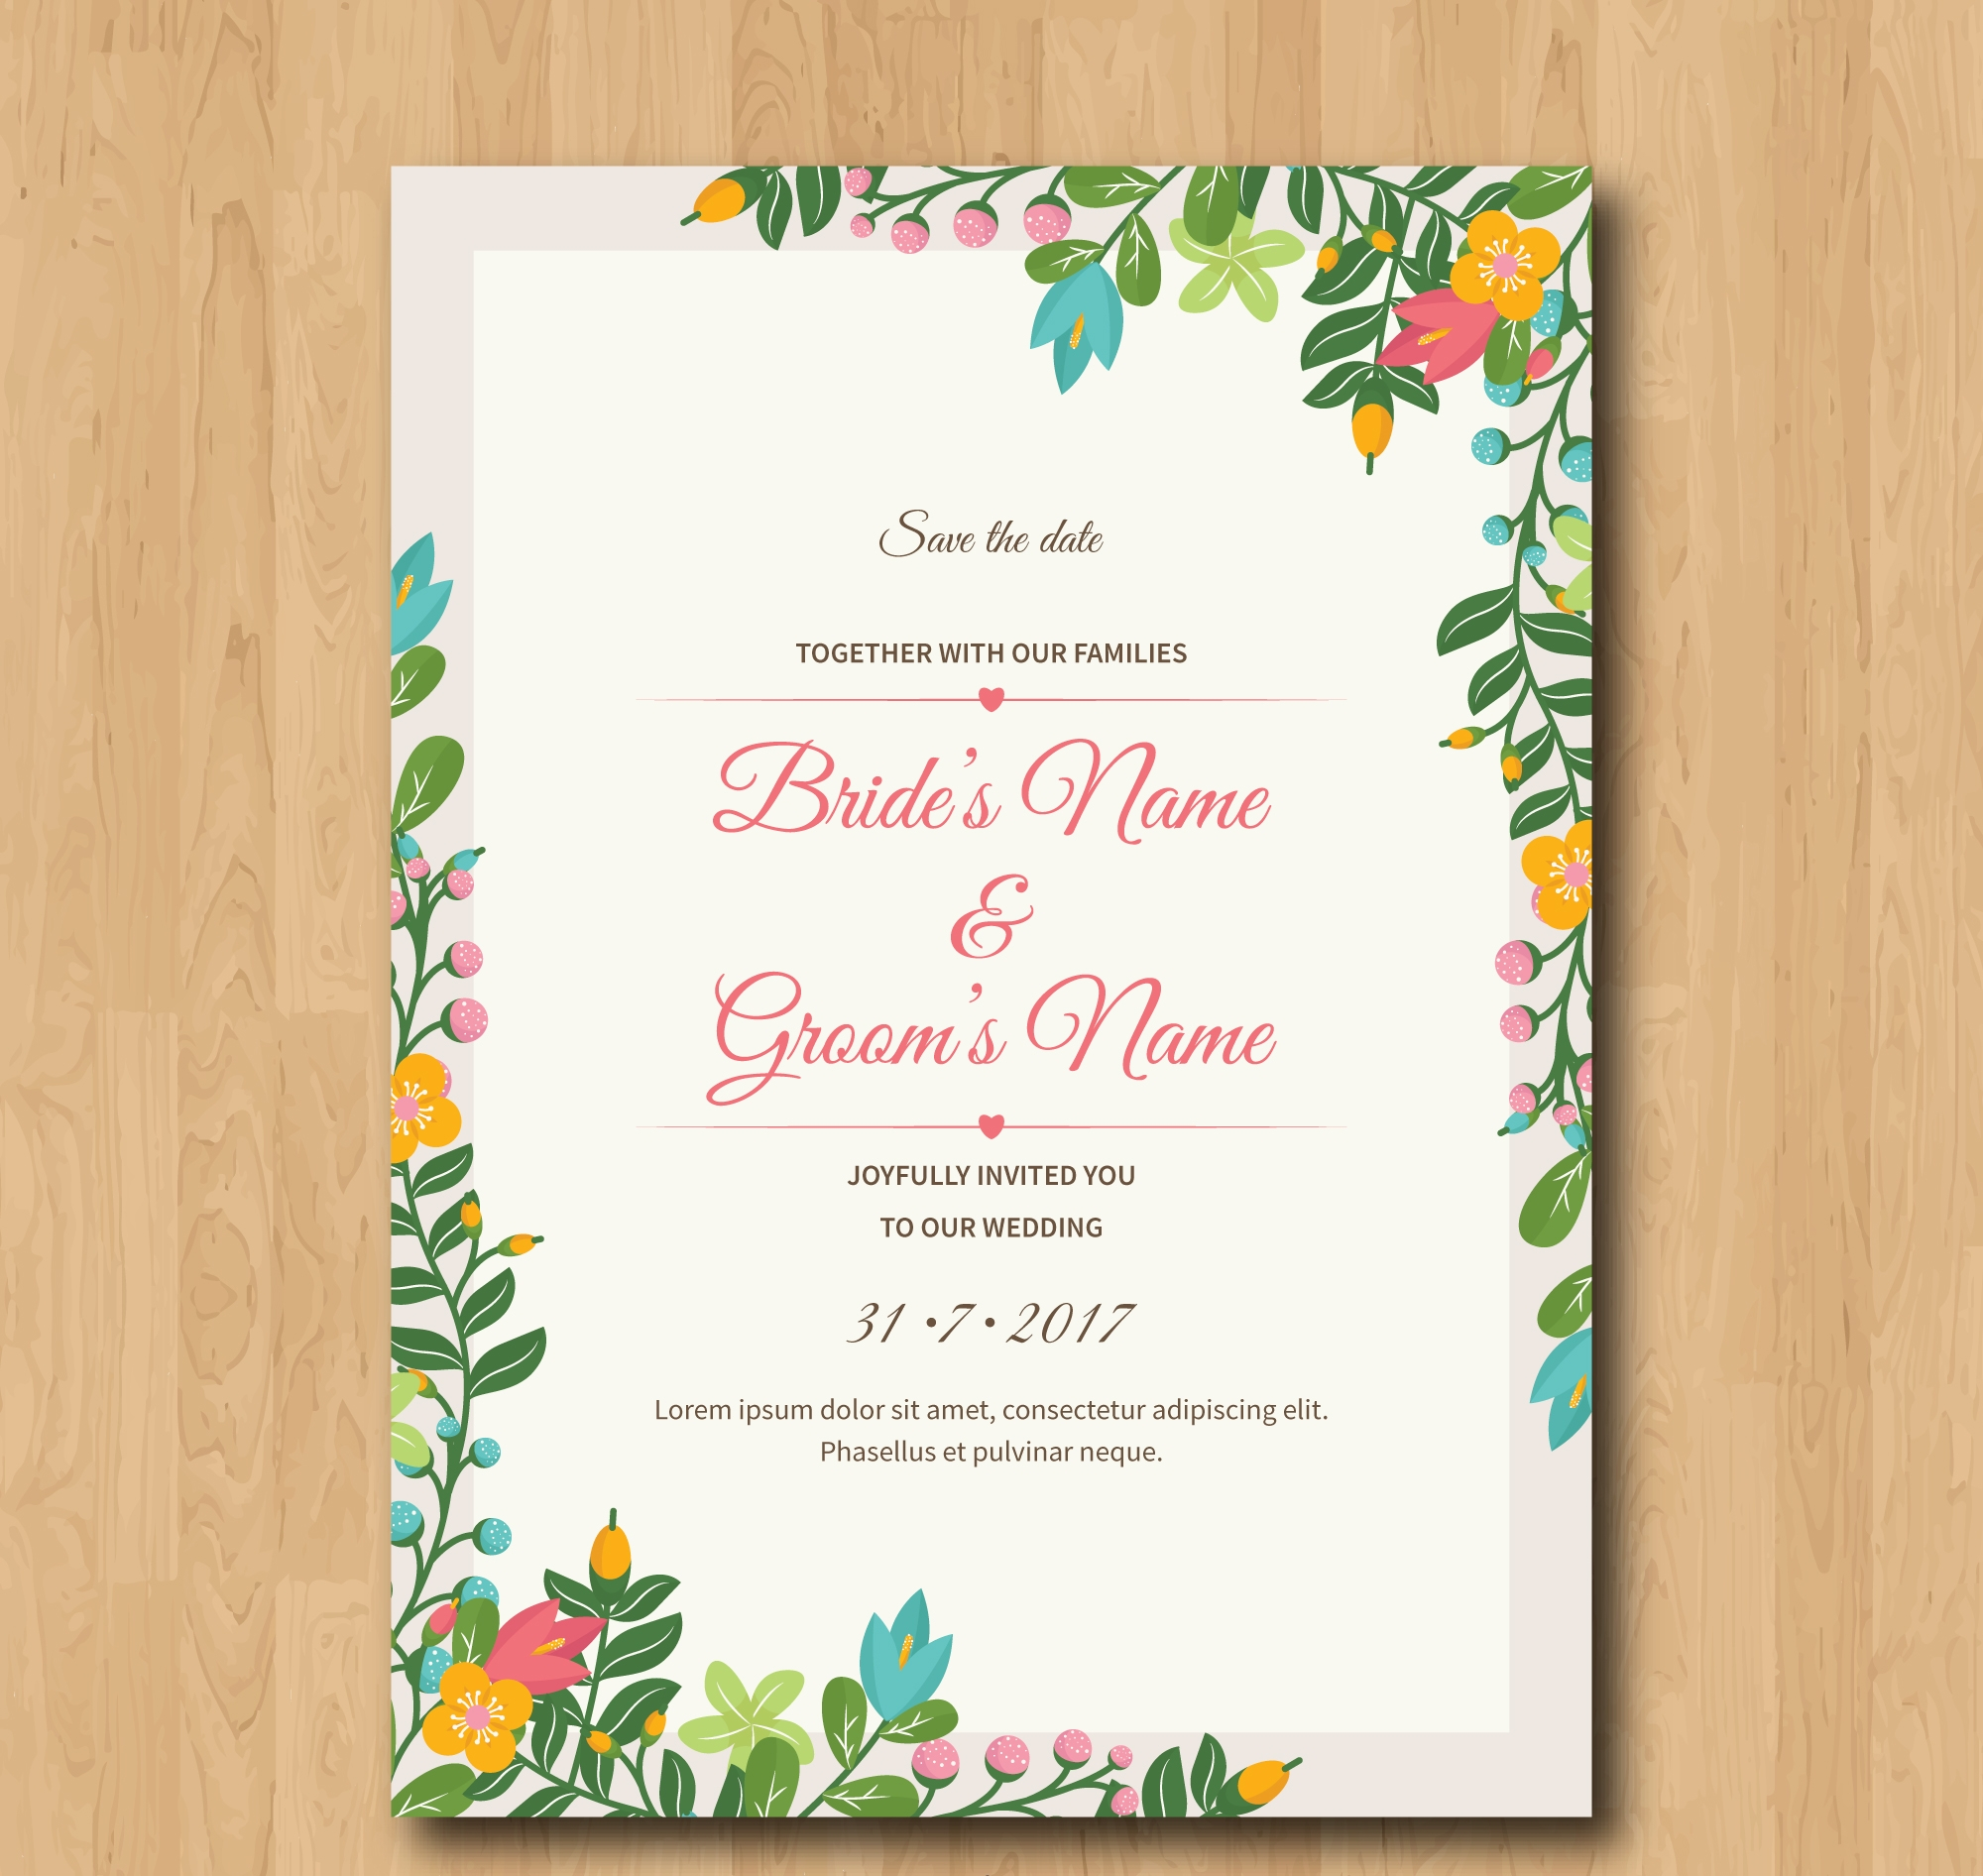 best wedding invitation with flowers